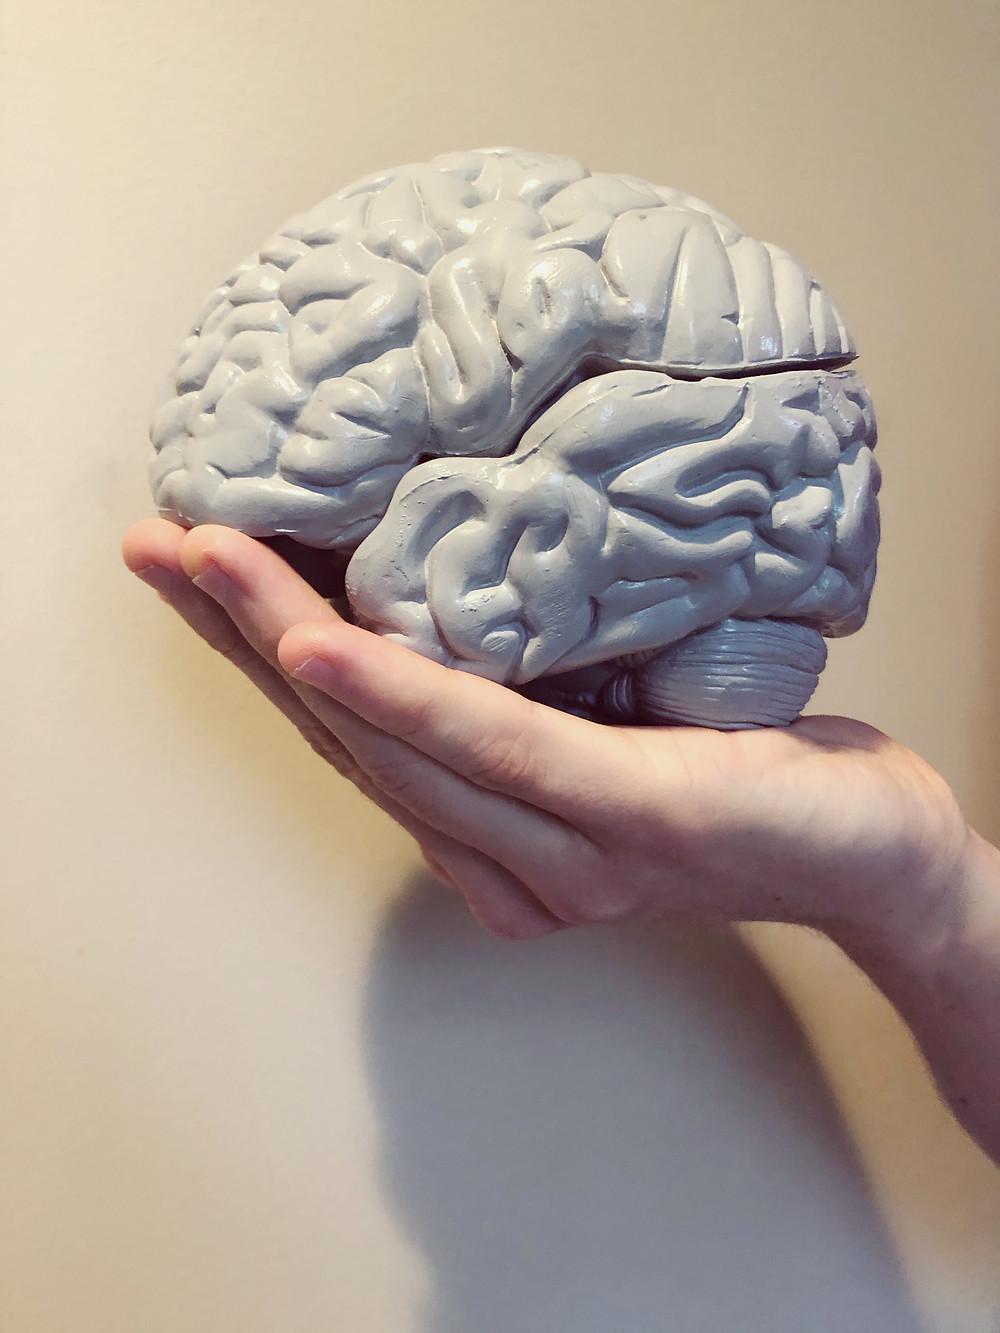 Hand holding a brain model #mentalhealth